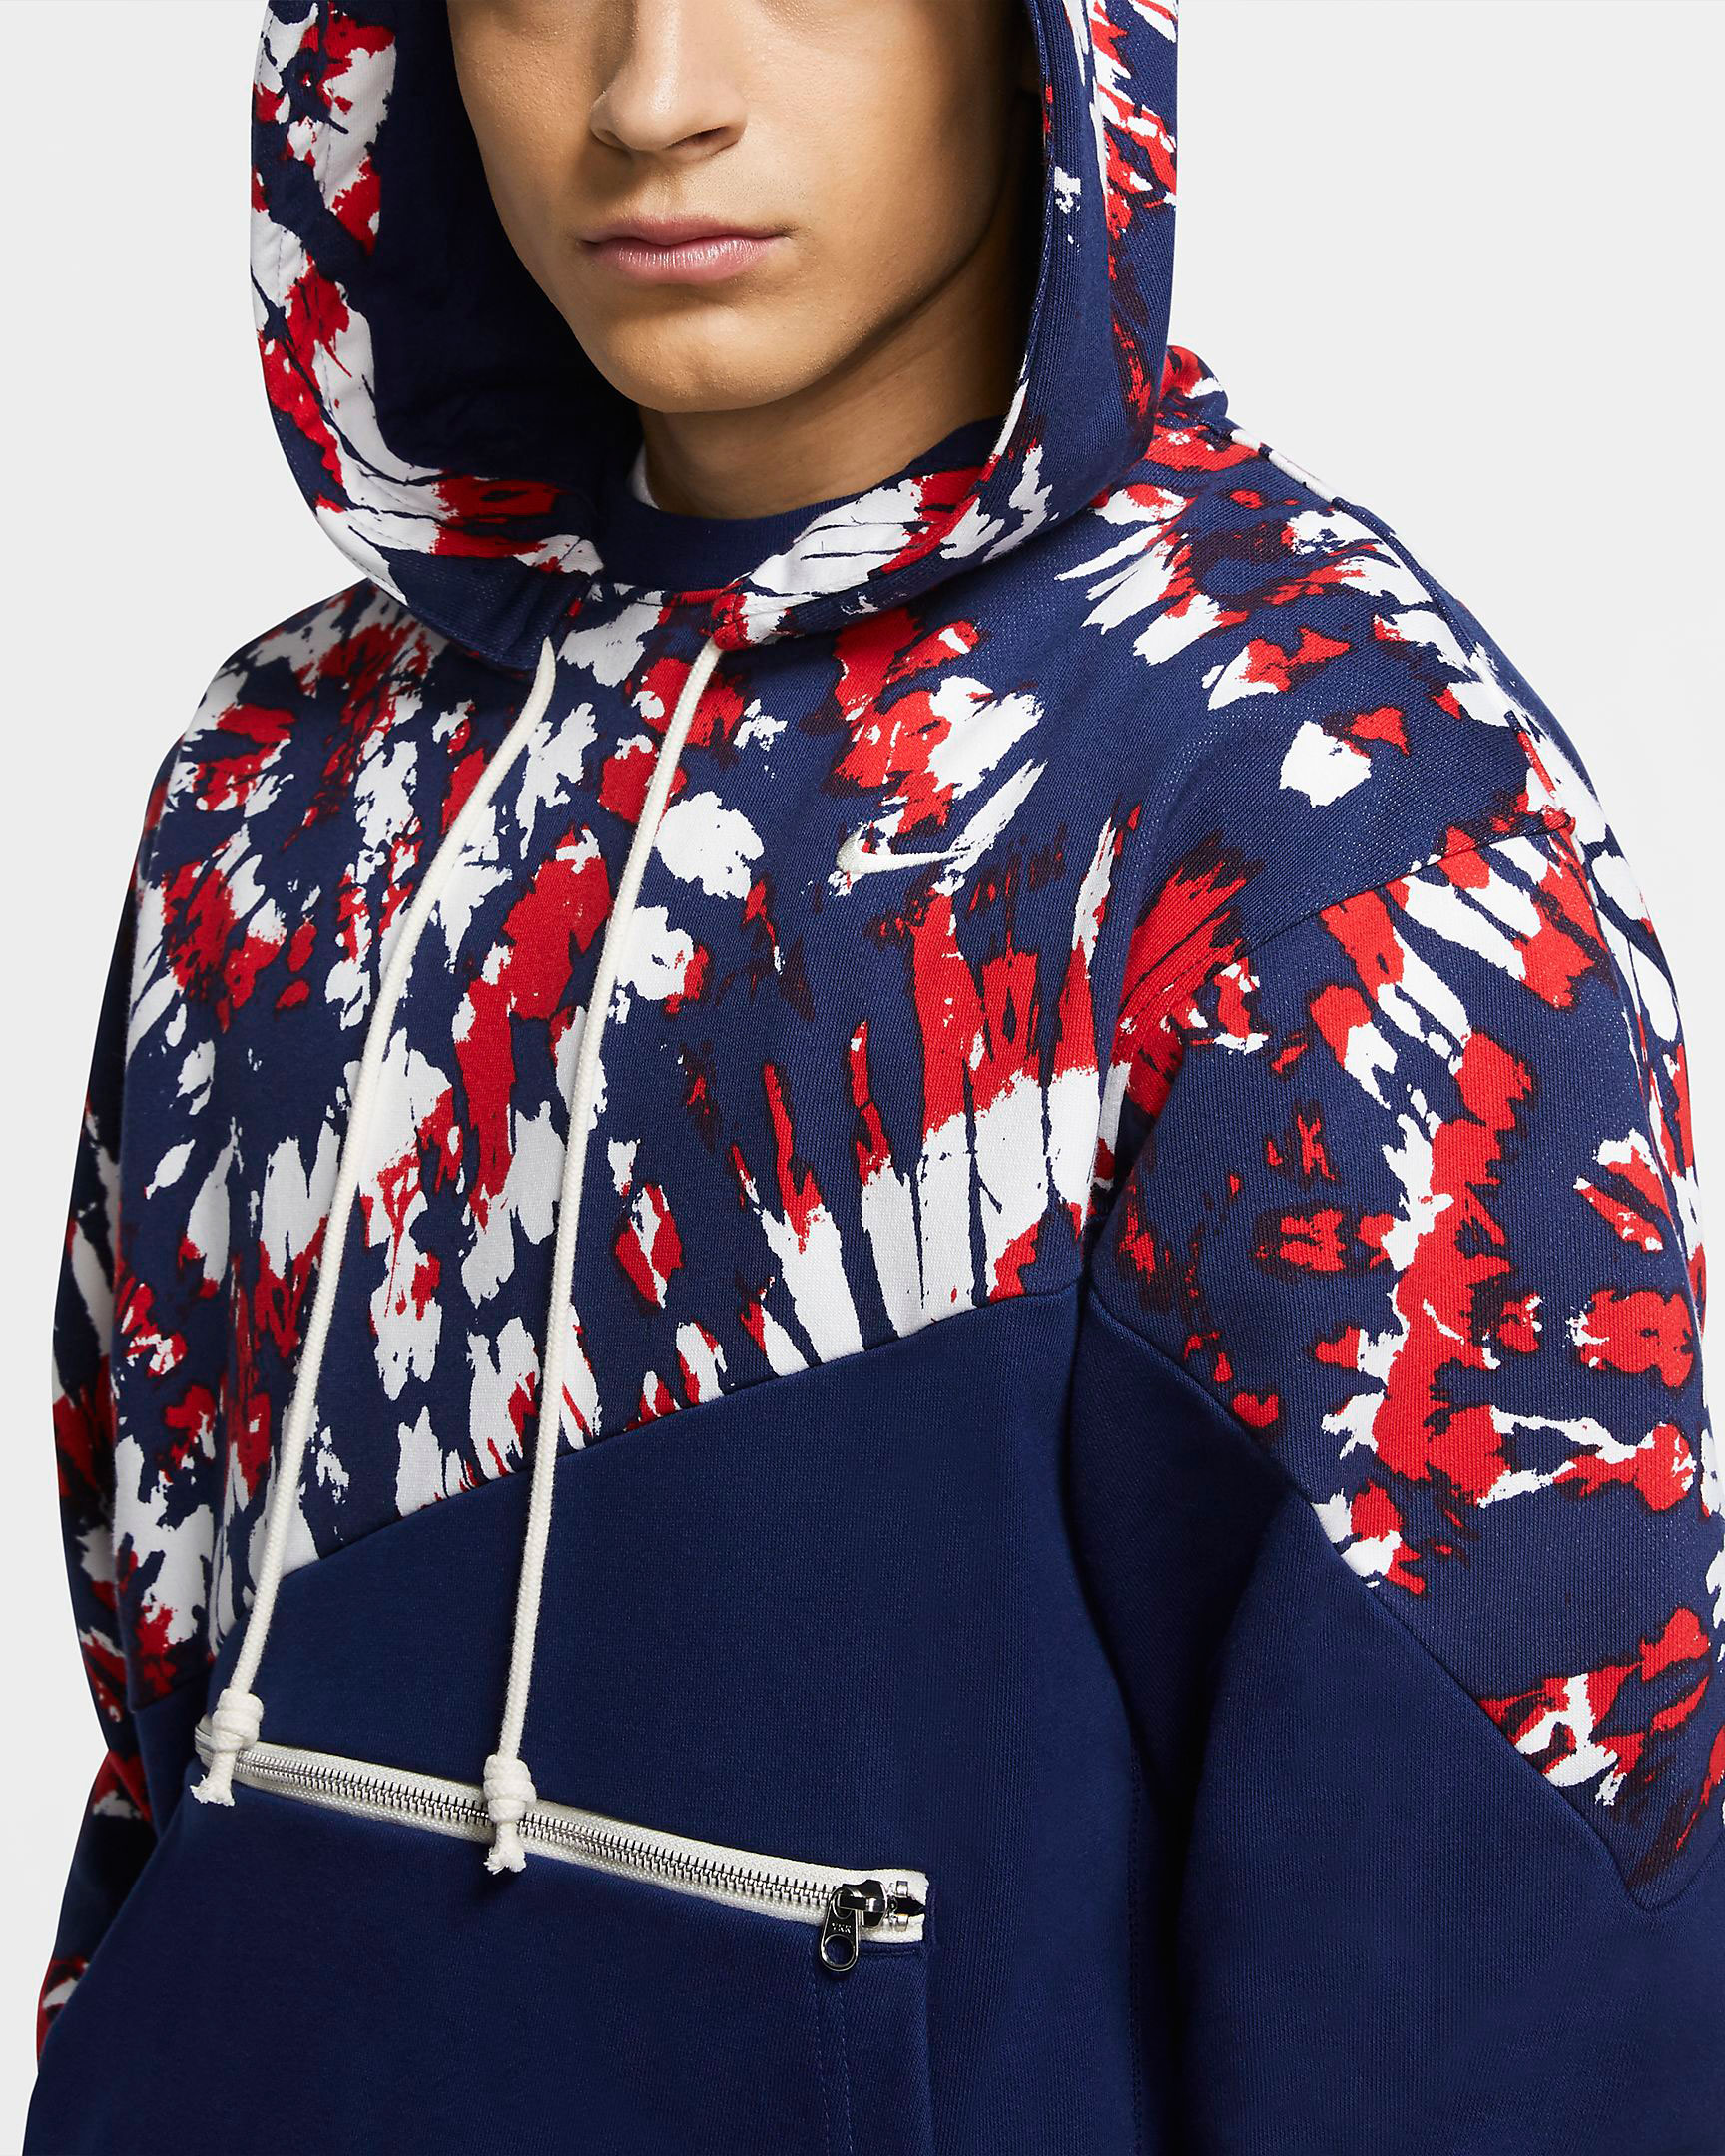 nike-lebron-17-graffiti-fire-red-cold-blue-hoodie